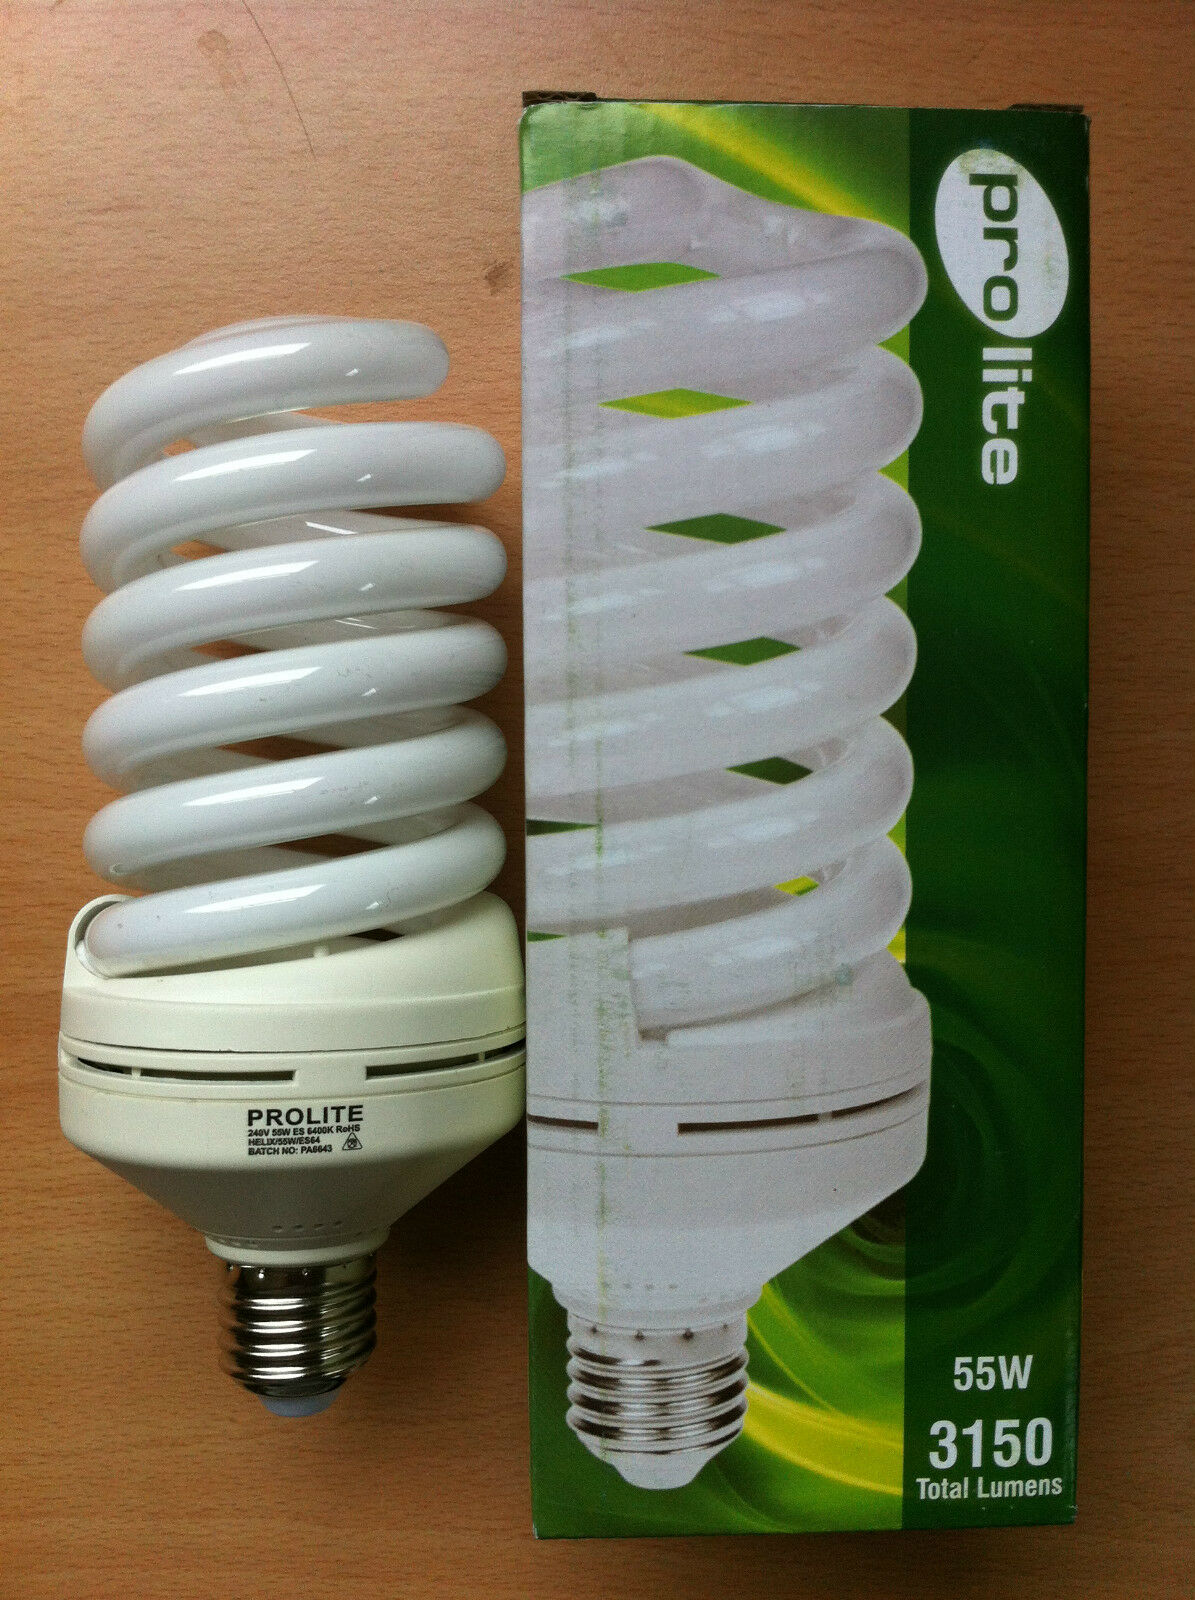 55w watt ES E27 Screw In Energy Saving Spiral CFL Daylight 6400k Bulb x 4